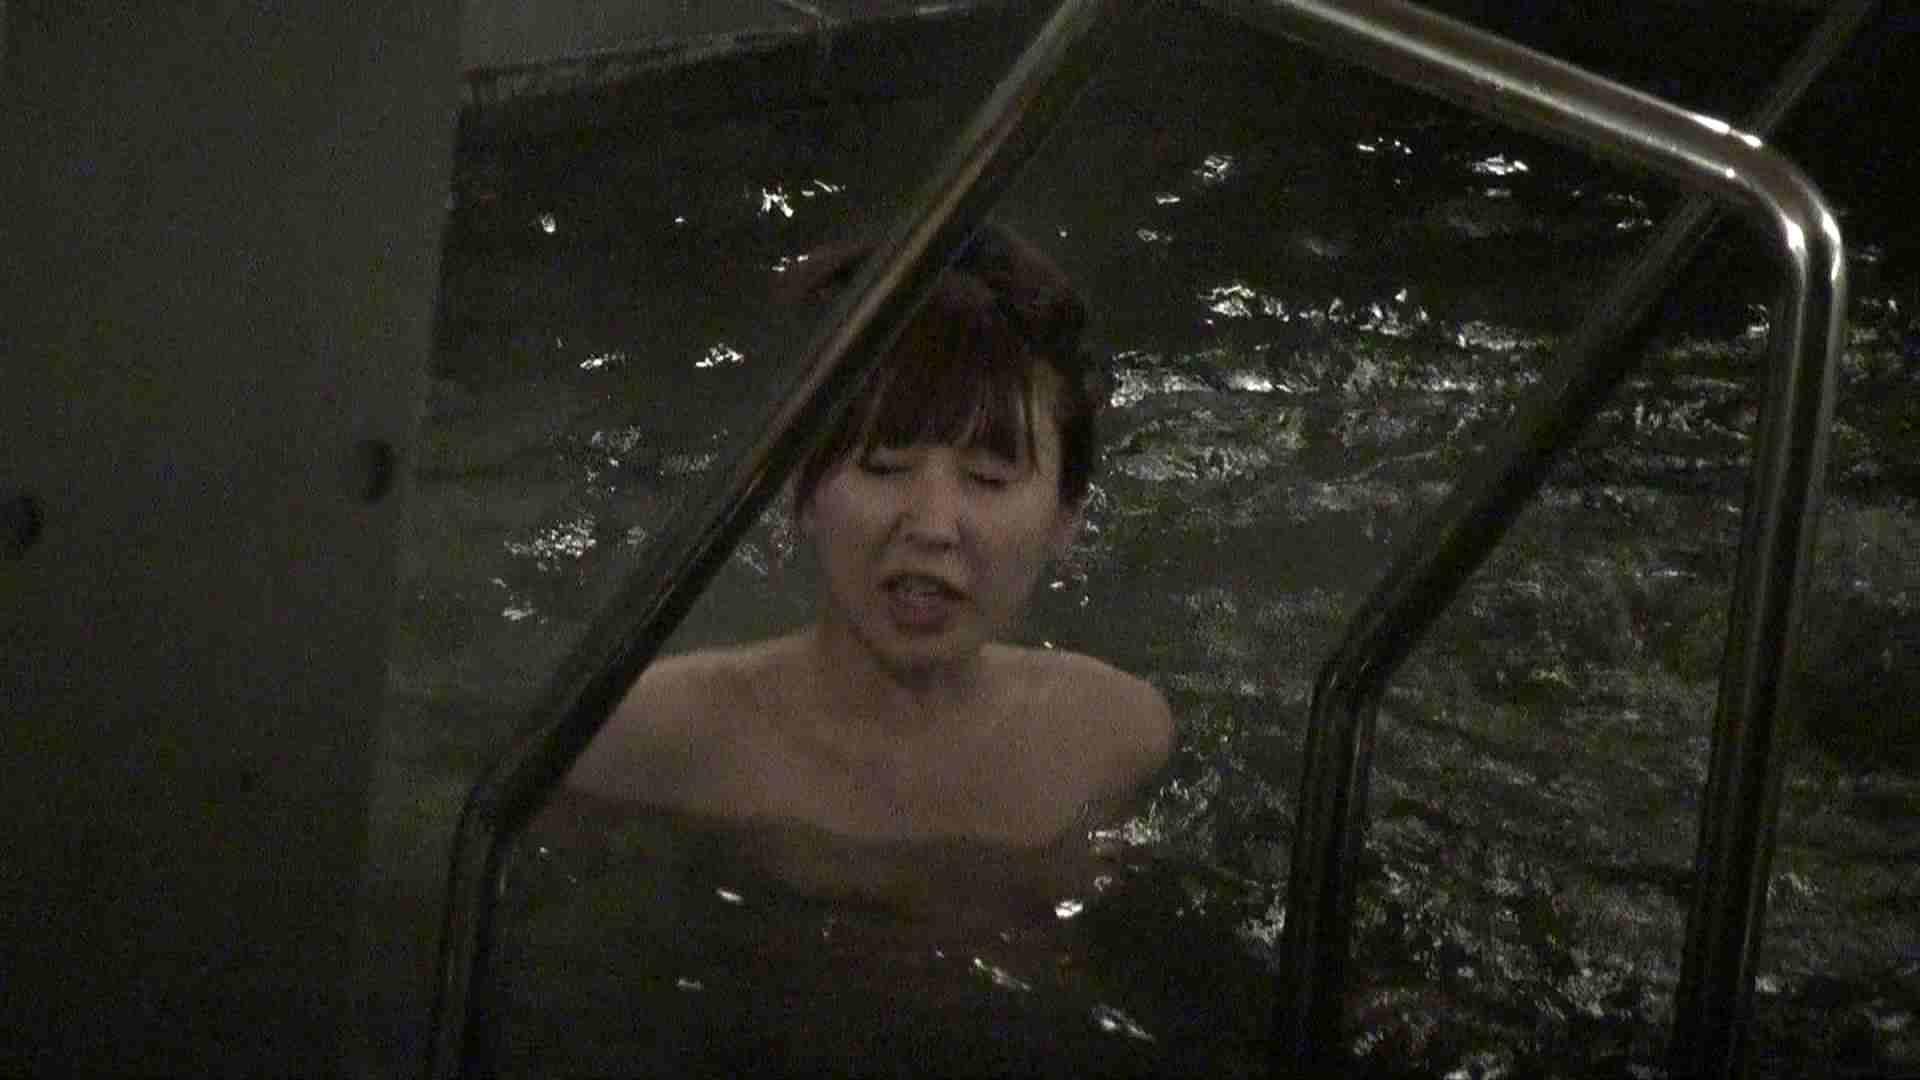 Aquaな露天風呂Vol.410 盗撮  73連発 72